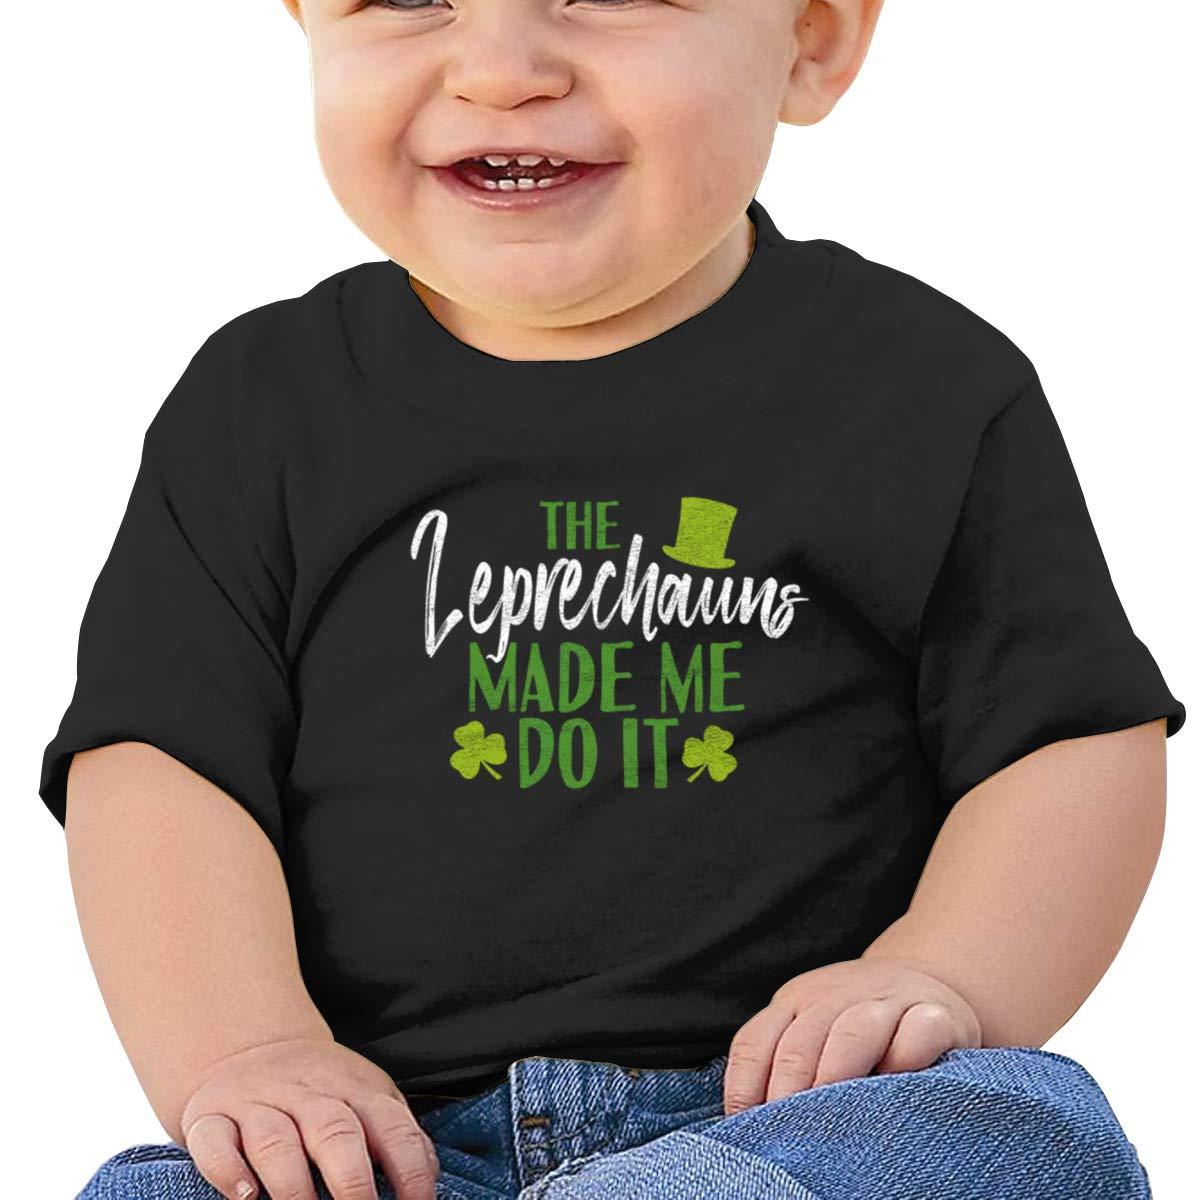 Qiop Nee The Leprechauns Made Me Do It Short-Sleeve T-Shirt Baby Boy